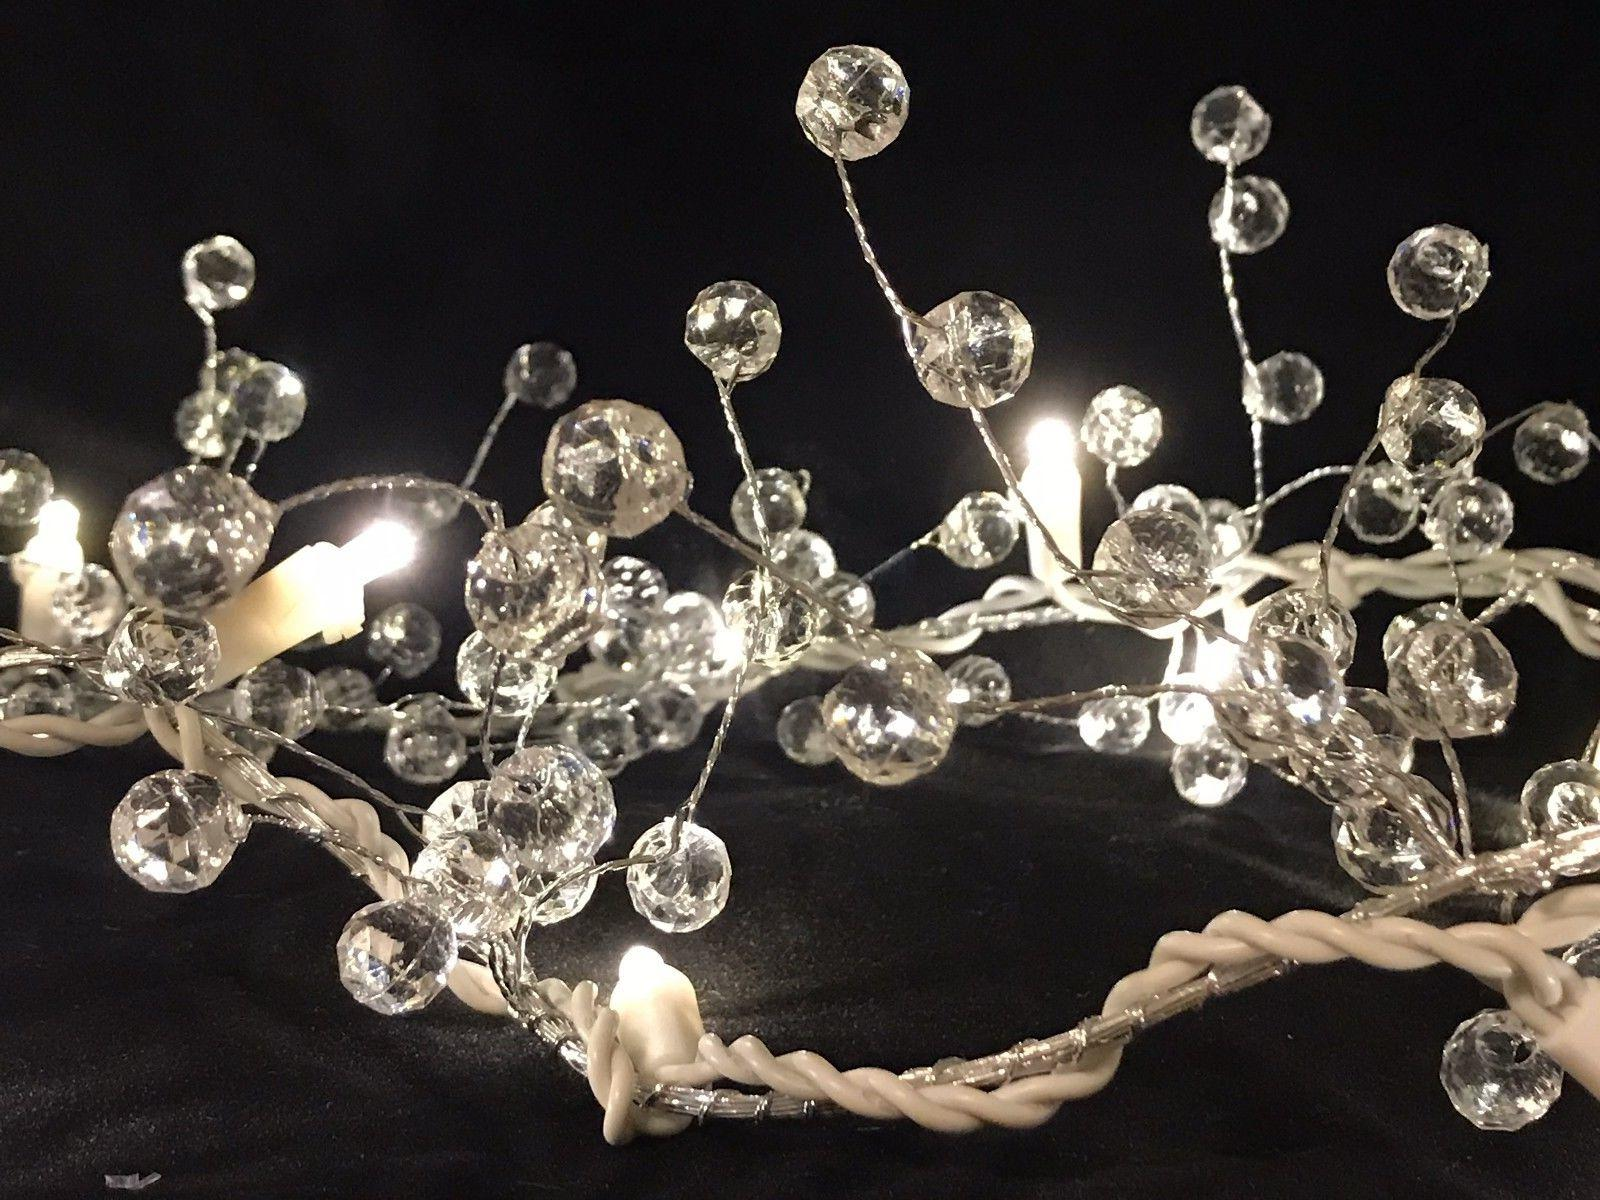 6ft Beaded Acrylic Garland String Light Seasonal Lighting Ev